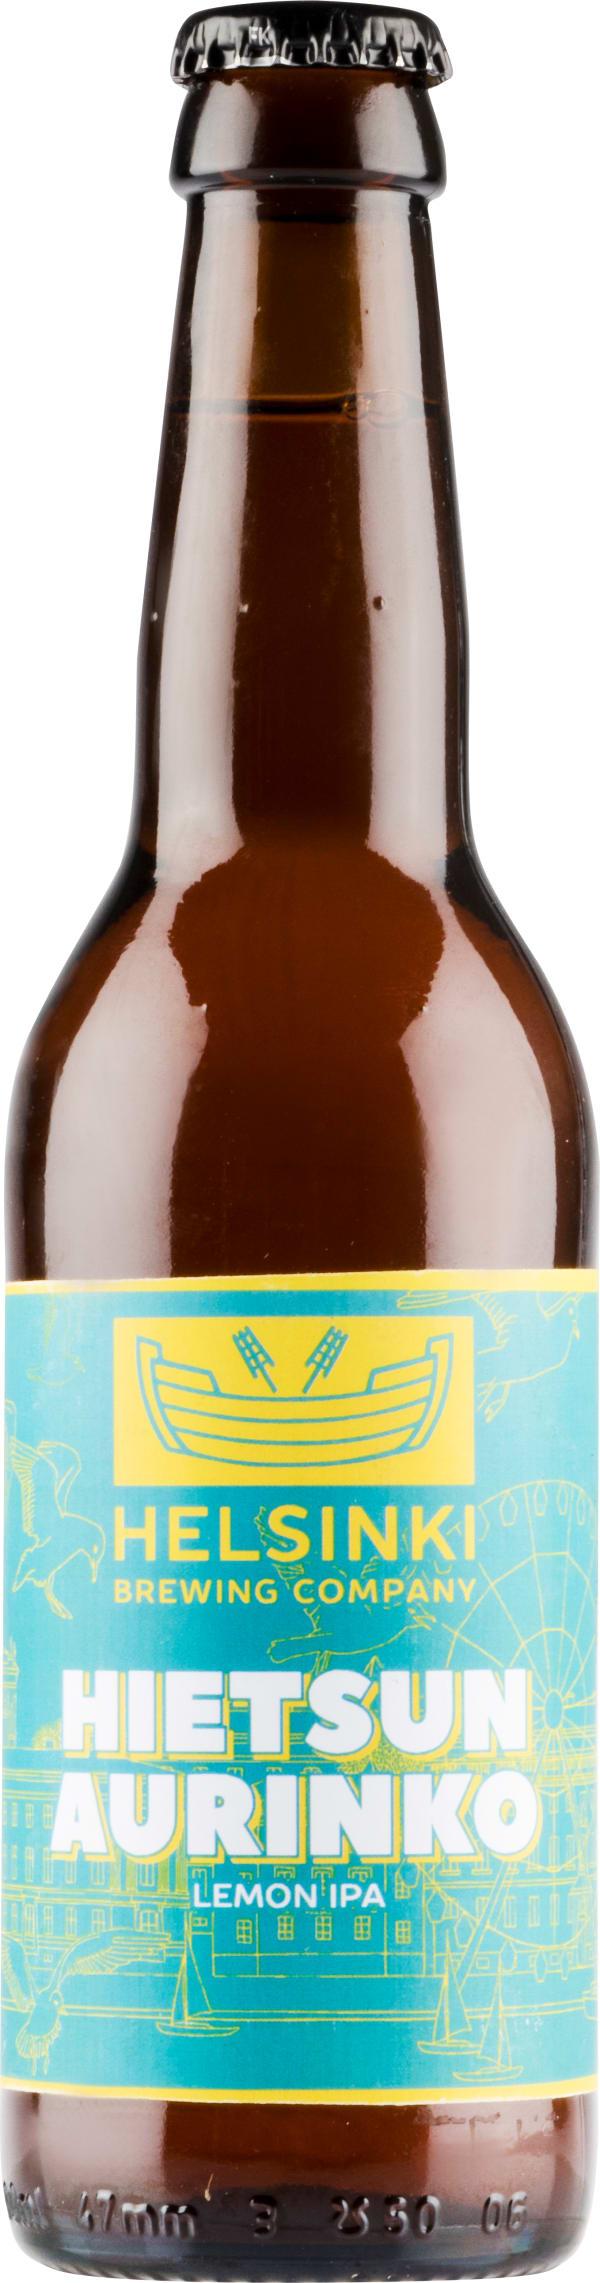 Helsinki Brewing Hietsun Aurinko Lemon IPA